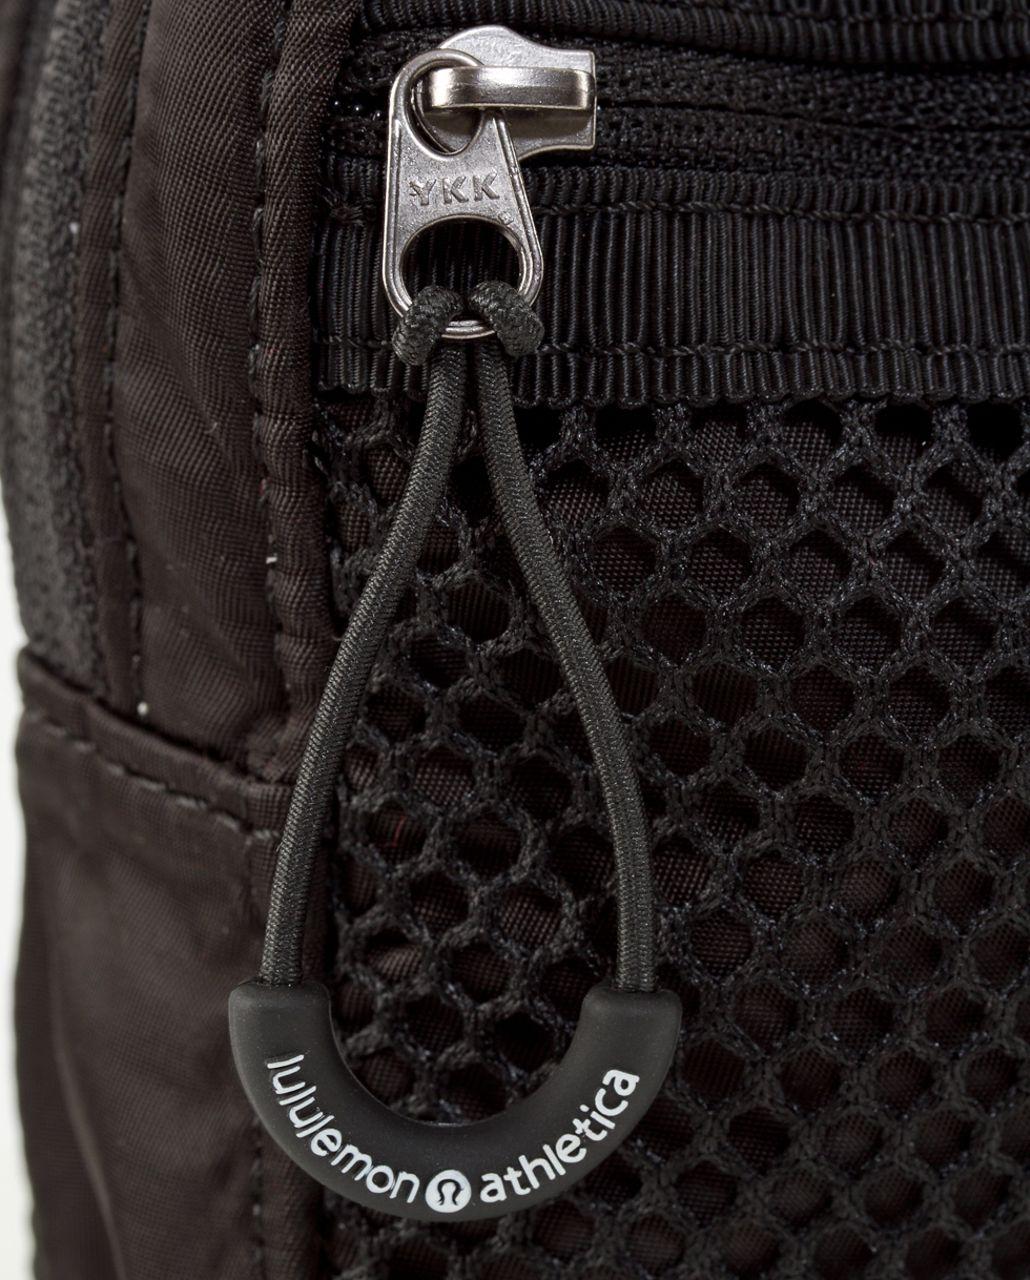 Lululemon Gym Essentials Kit - Black